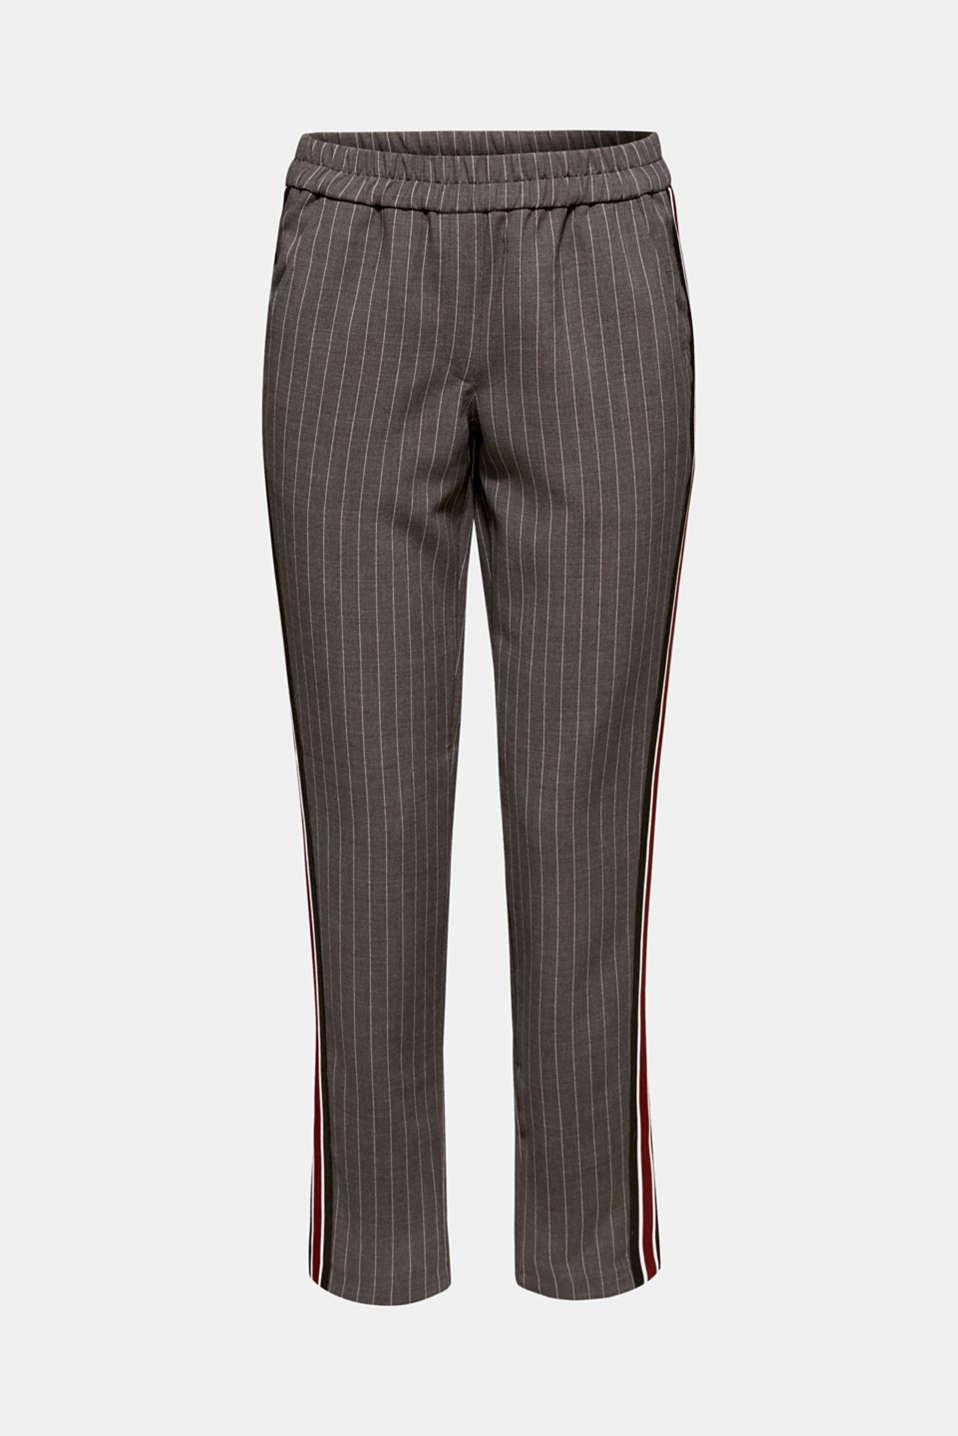 Pants woven, DARK GREY, detail image number 7